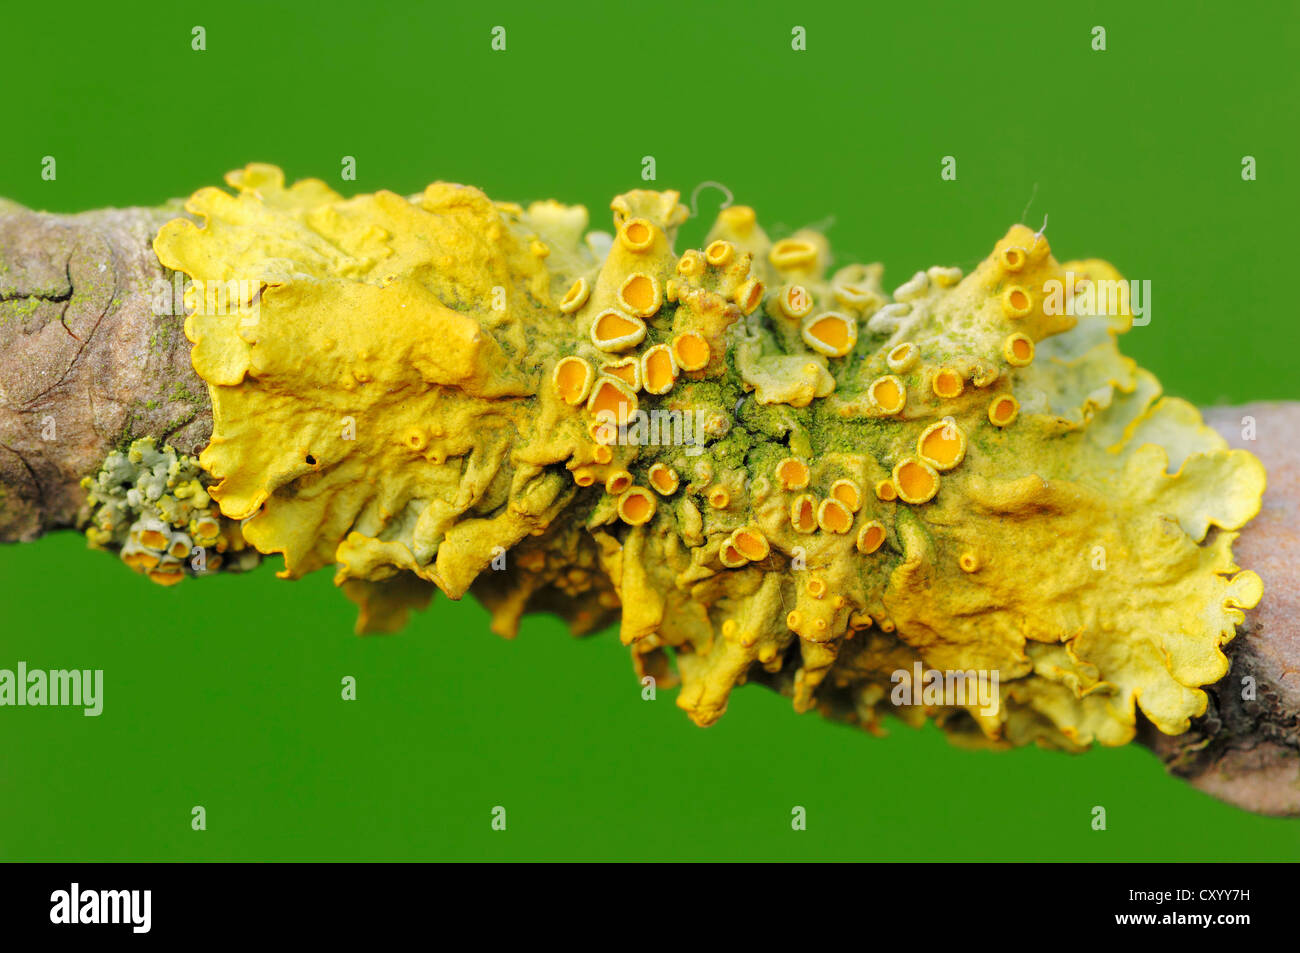 Common orange lichen, yellow scale (Xanthoria parietina) on a branch, North Rhine-Westphalia - Stock Image